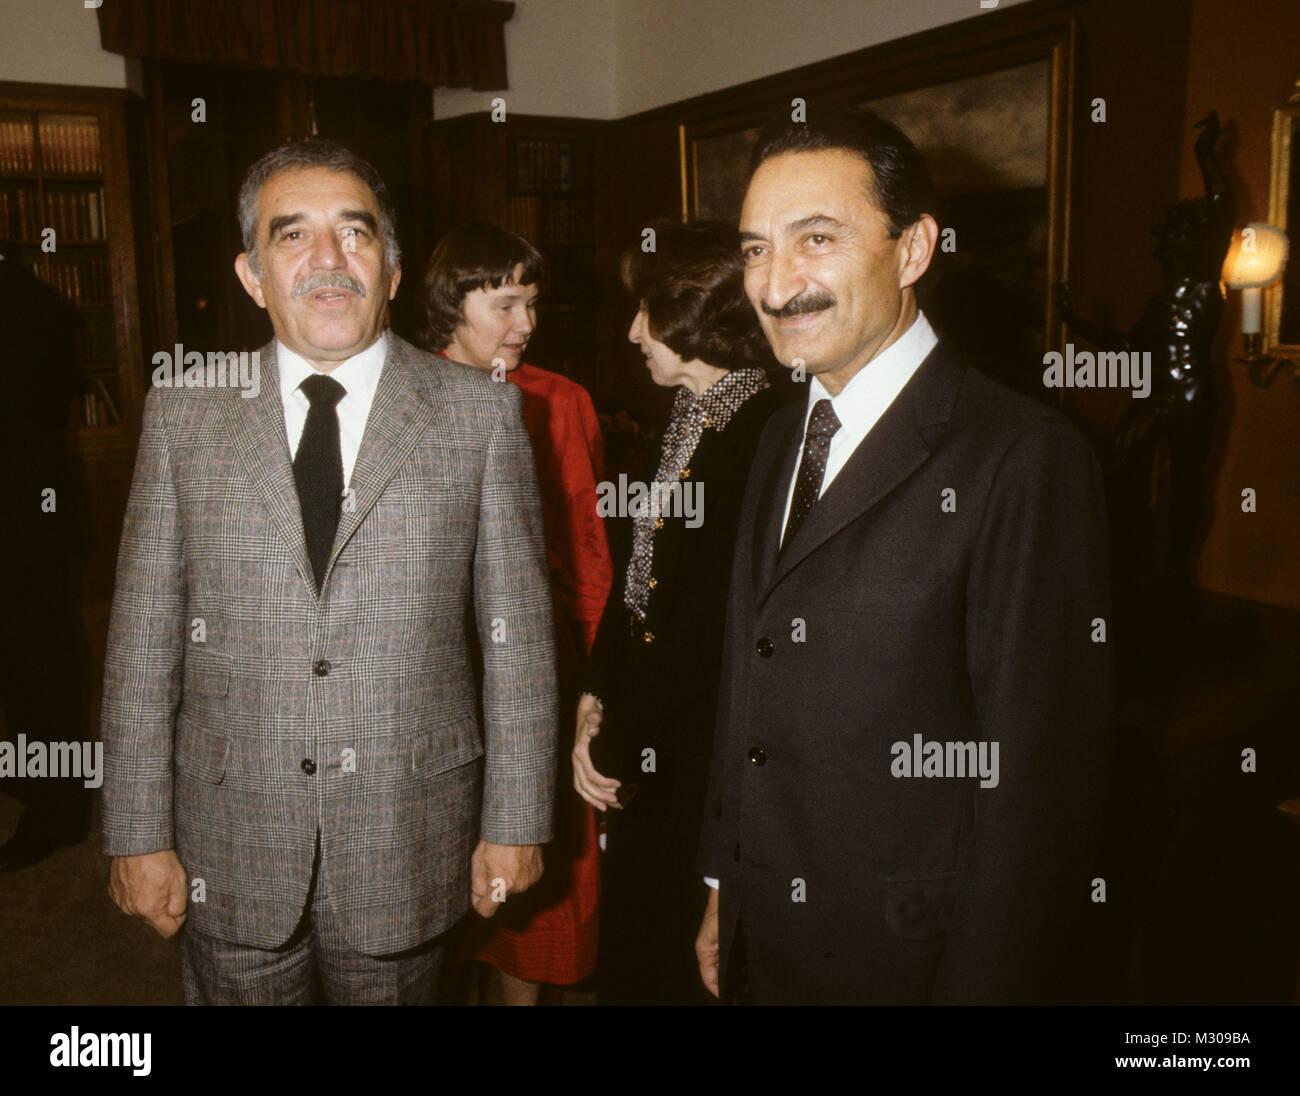 GABRIEL GARCIA MARQUEZ Nobel prize winner meeting with the Turkish politician Bülent Ecevit at Harpsund The Swedish Stock Photo